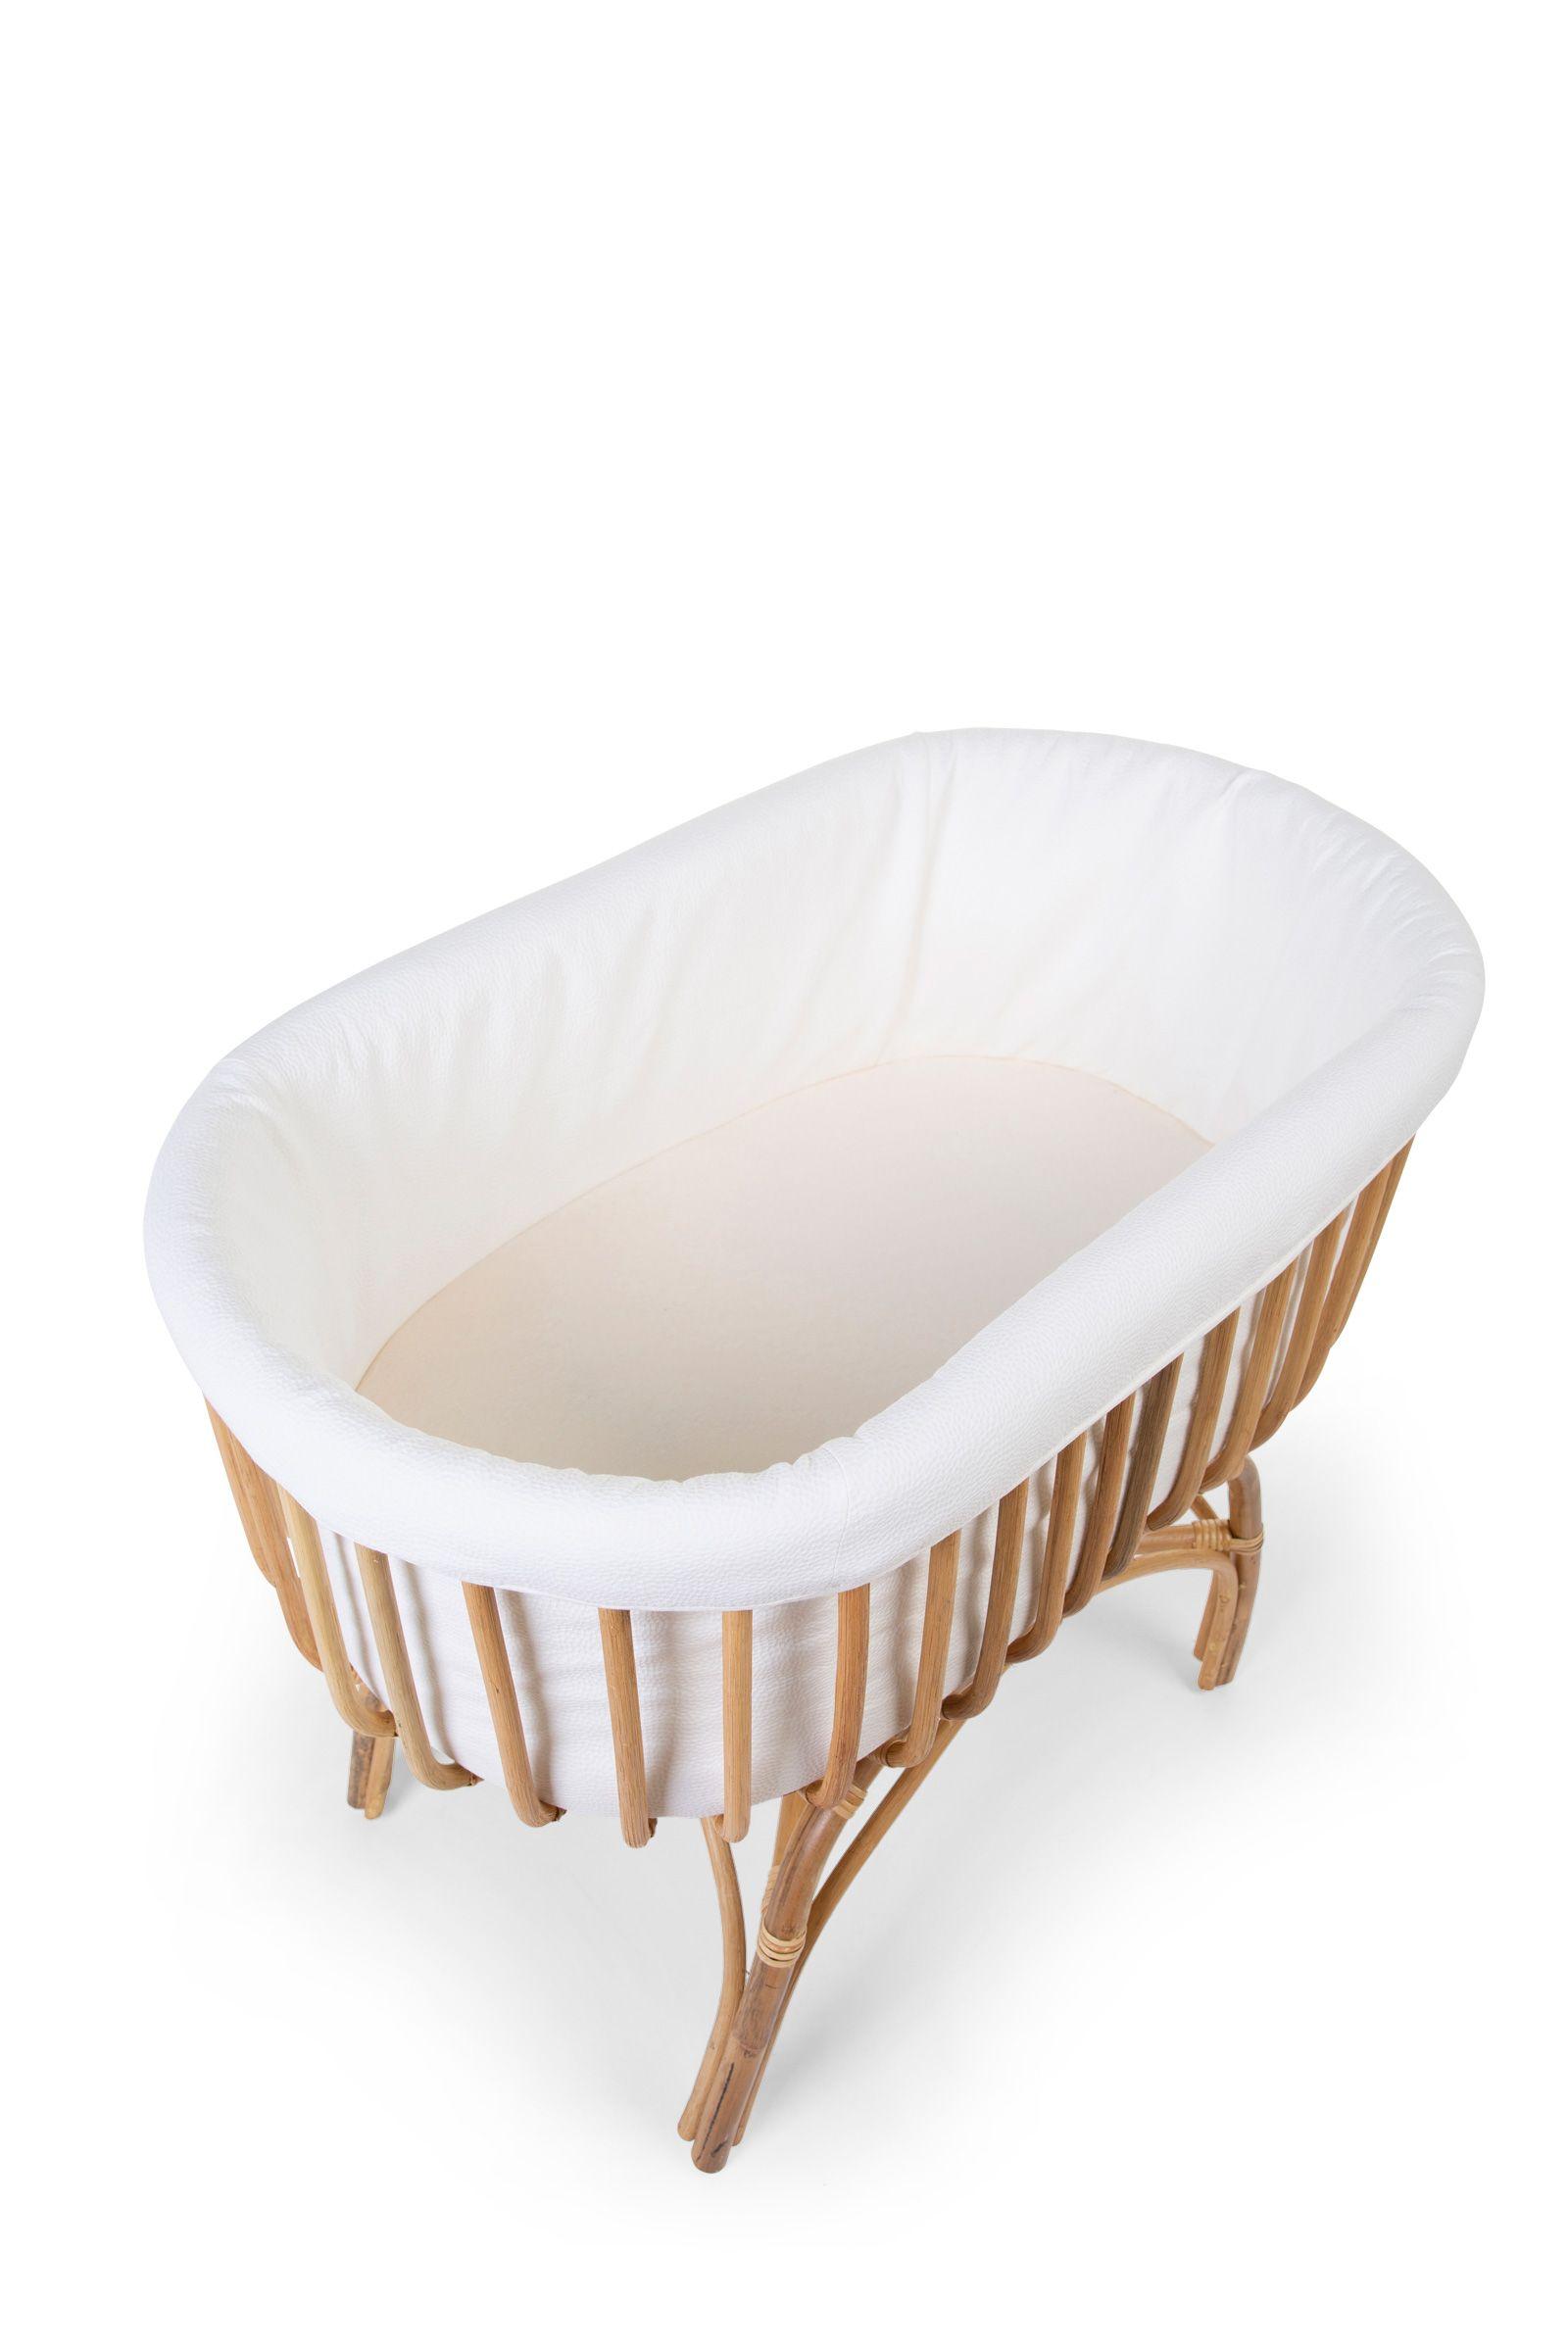 Childhome - Contour Pour Berceau Rotin - Jersey Off-white